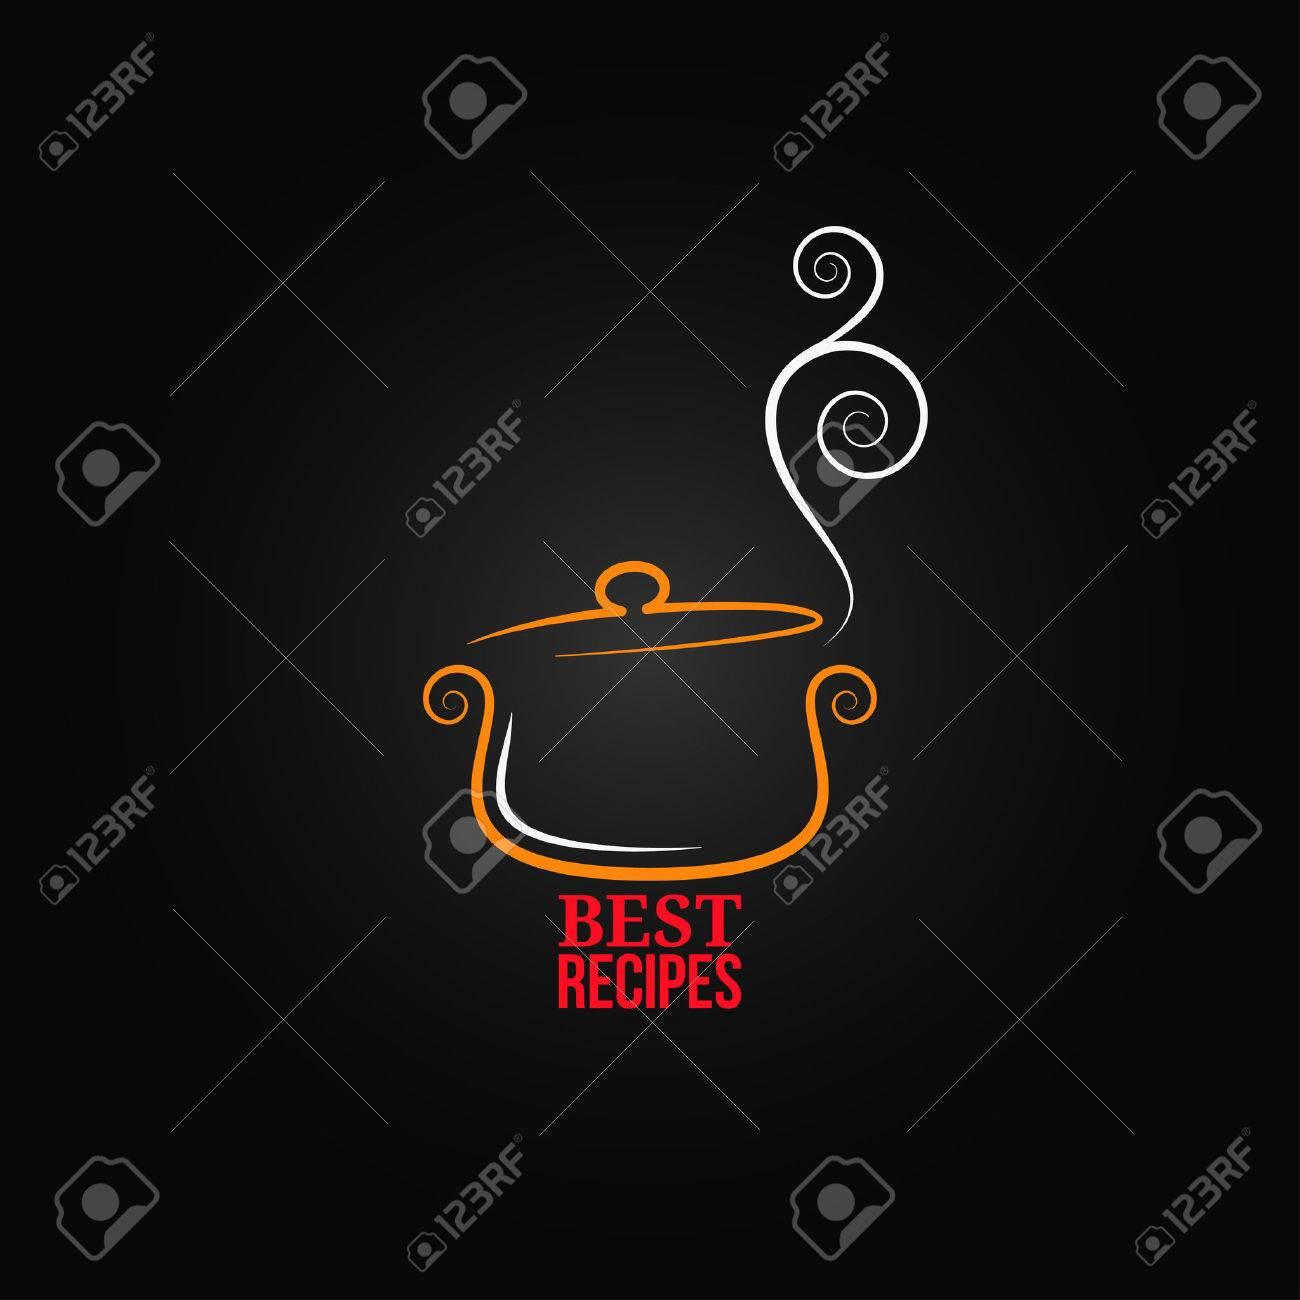 saucepan ornament background - 38607310